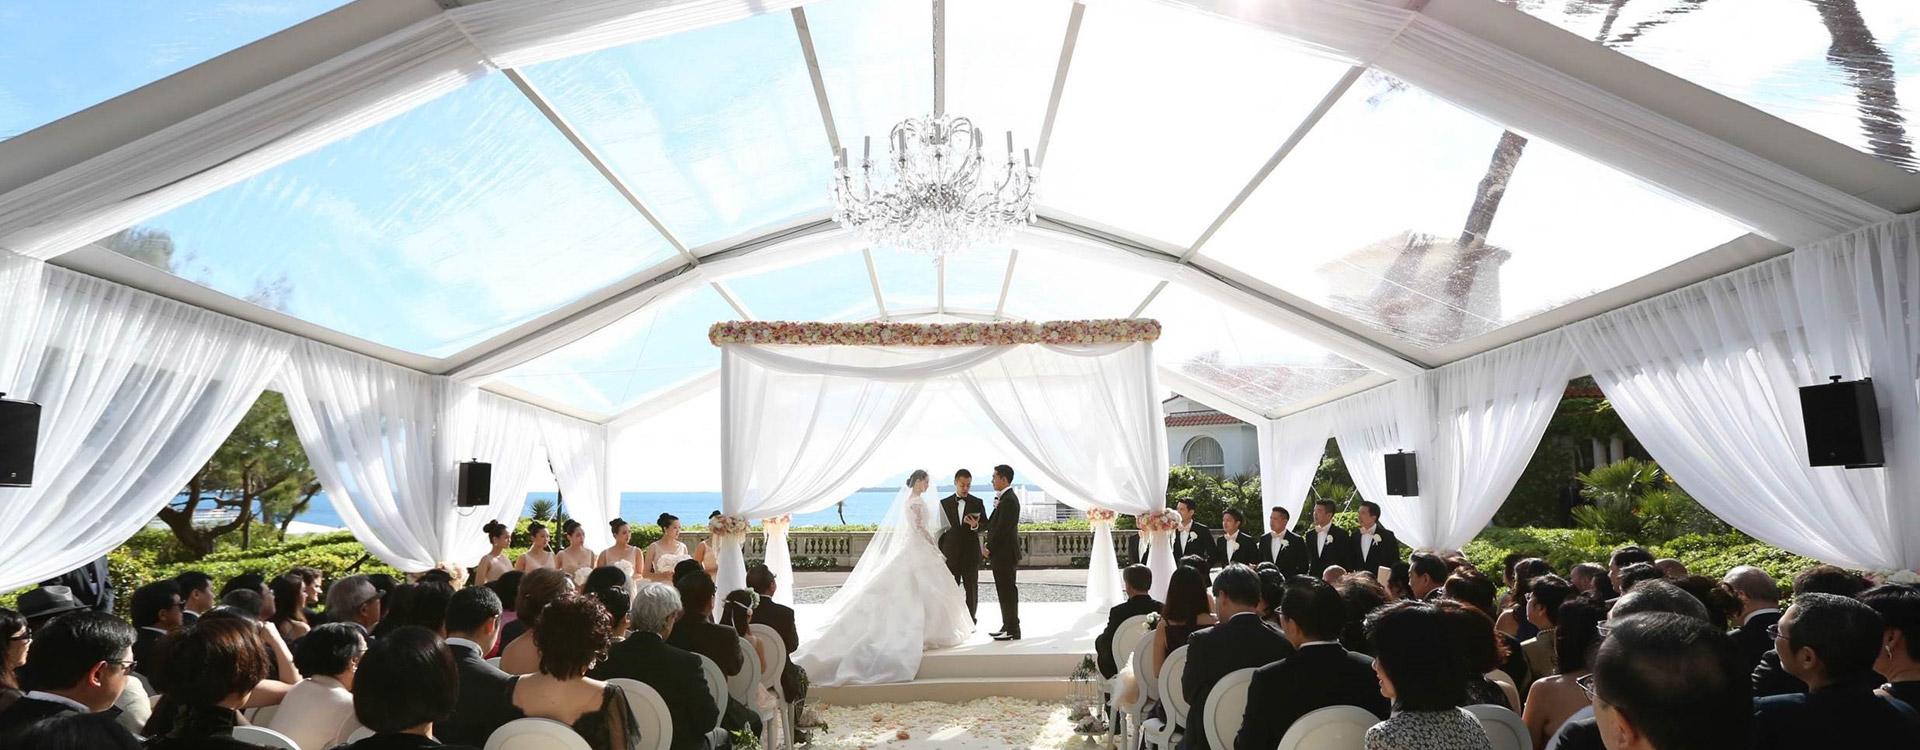 Wedding Venue In Cote Dazur Hotel Du Cap Eden Roc